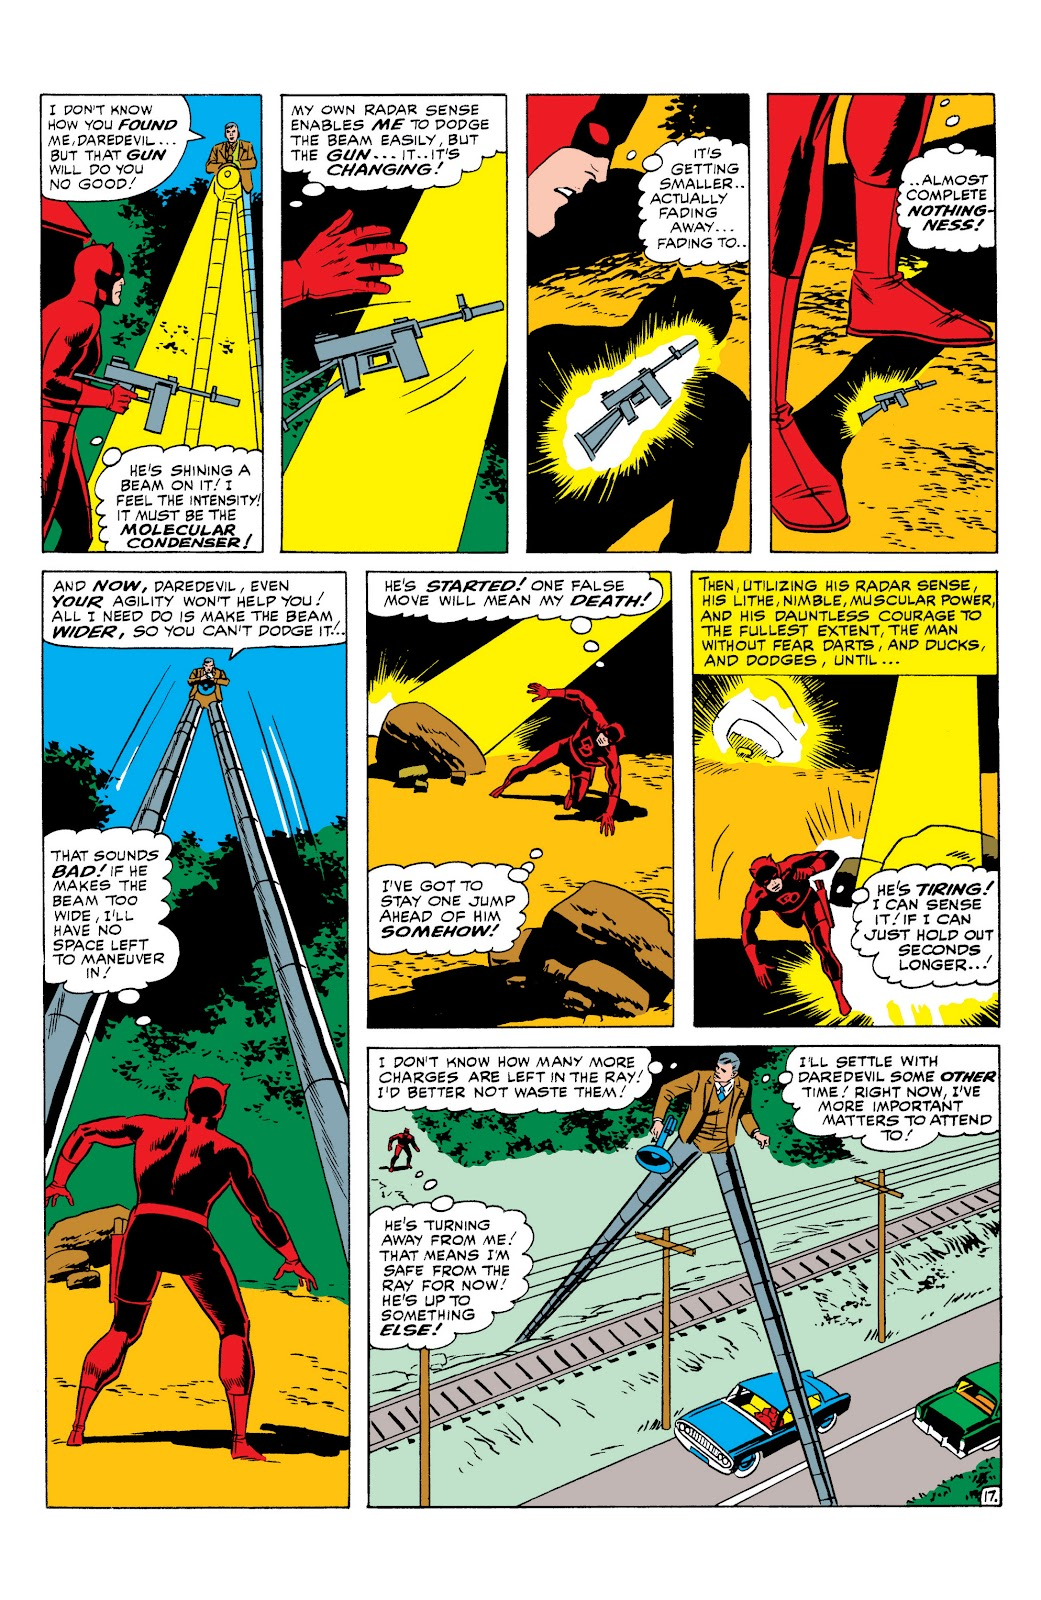 Read online Marvel Masterworks: Daredevil comic - Issue # TPB 1 (Part 2) - 81